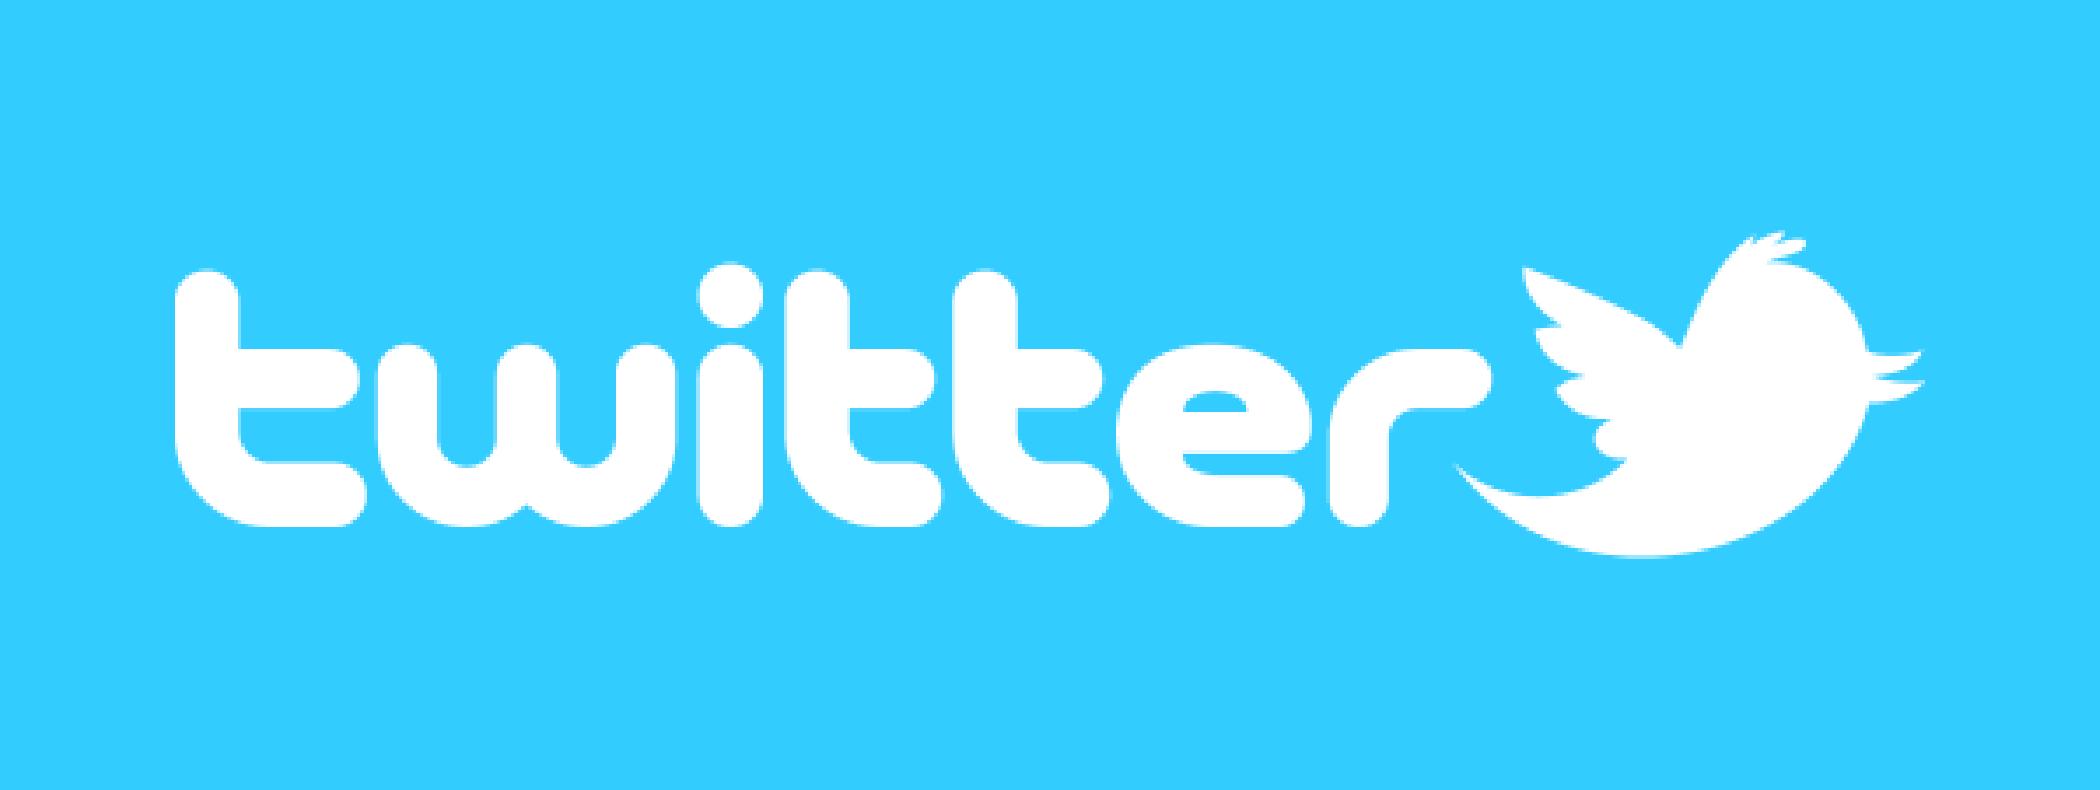 Twitter Wave Analysis – 27 October, 2021